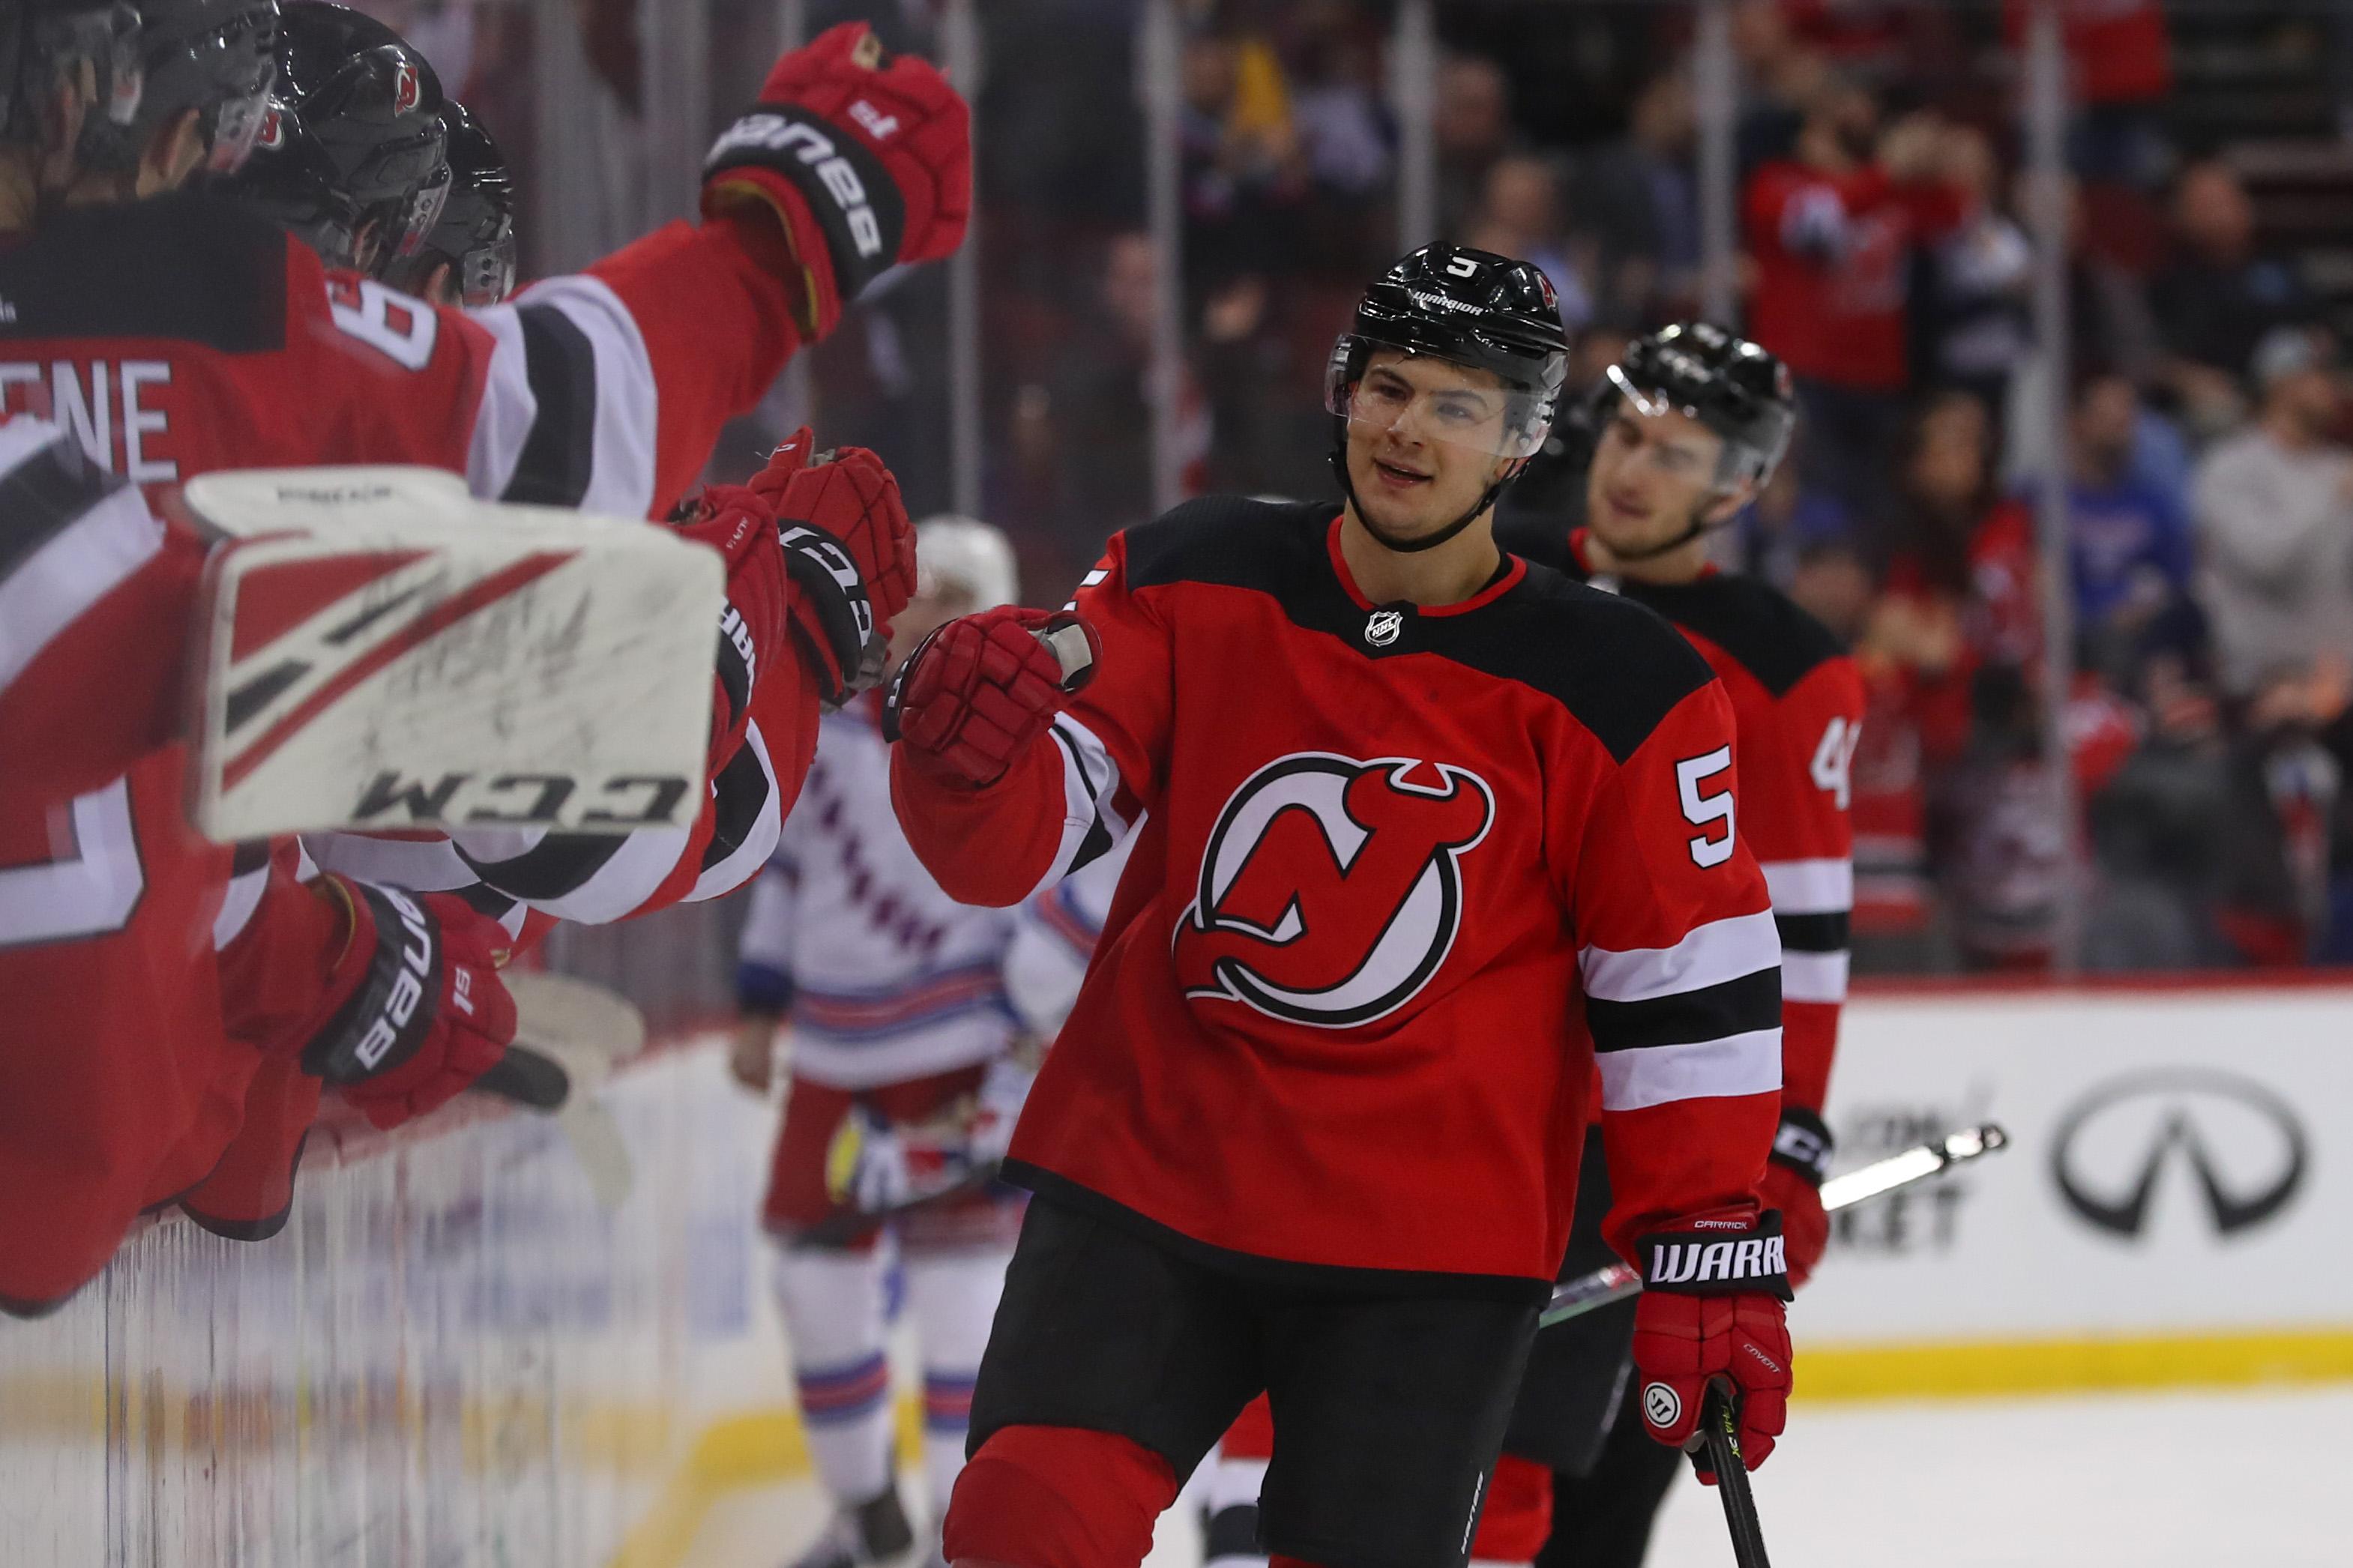 NHL: New York Rangers at New Jersey Devils